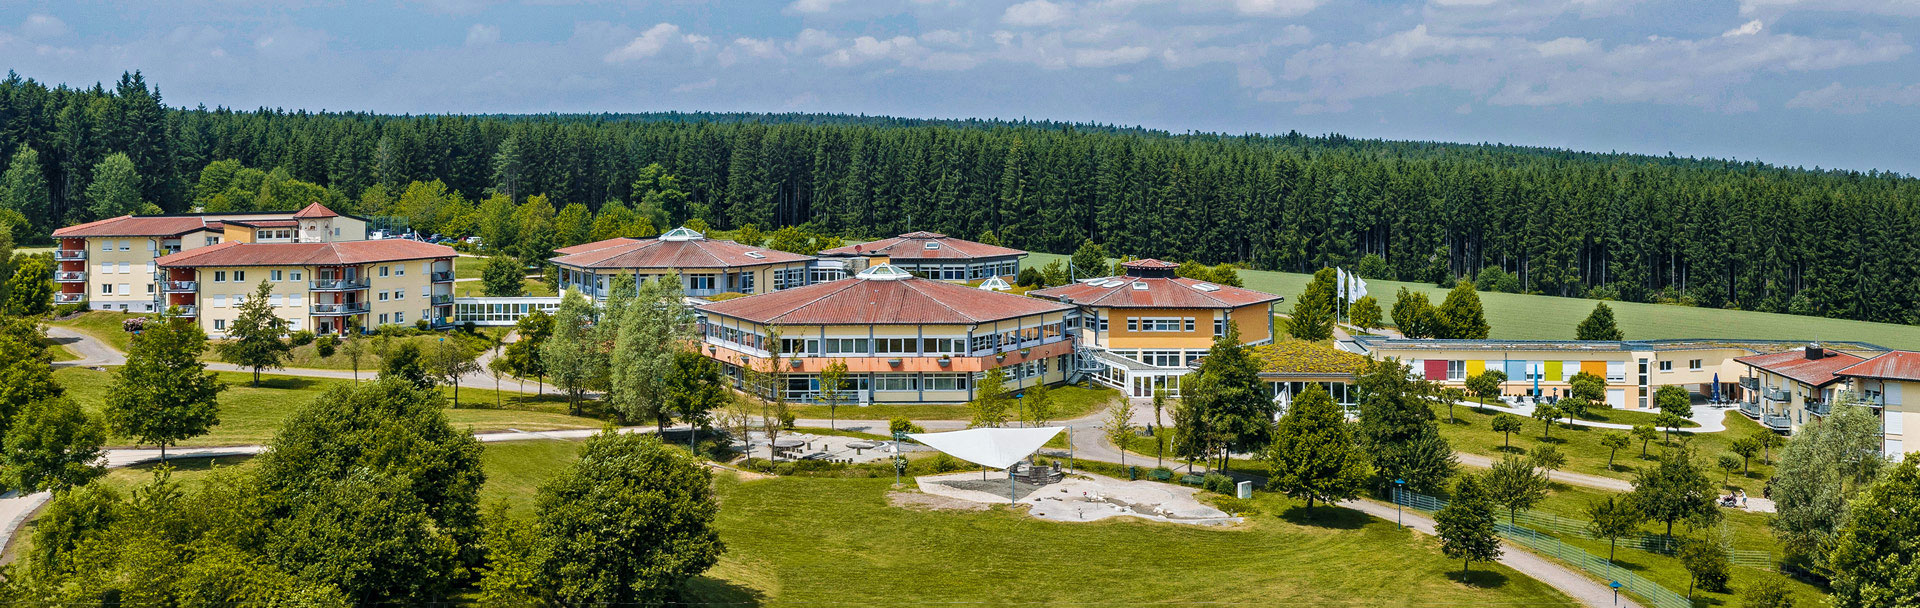 Panorama Tannheim